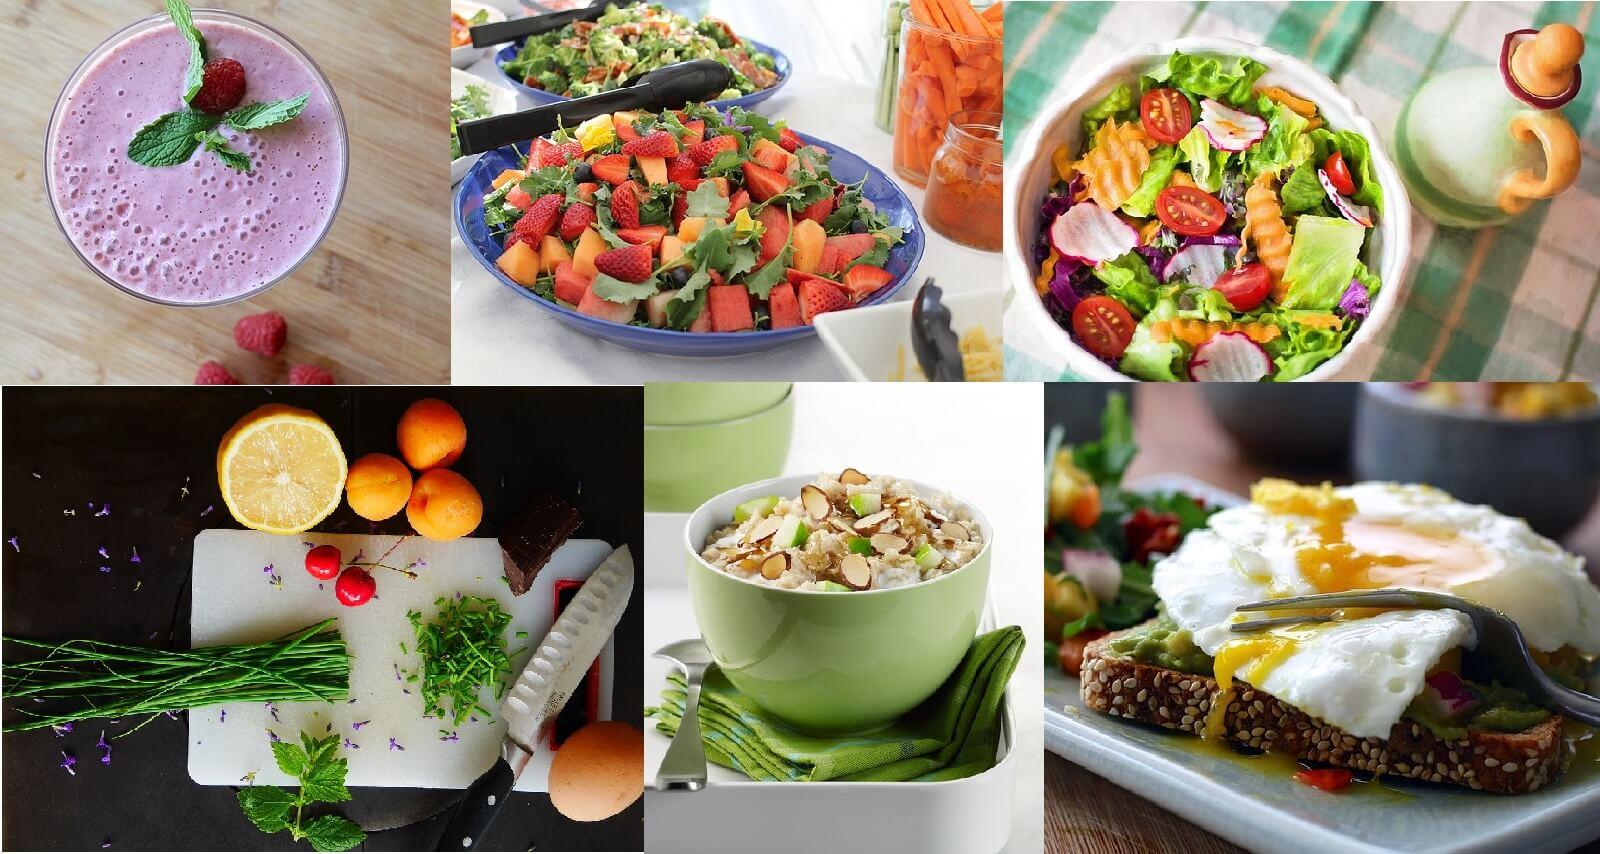 meal plan, dietitian, nutritionist, nutrition, food plan, food log, meal planning, laura berger